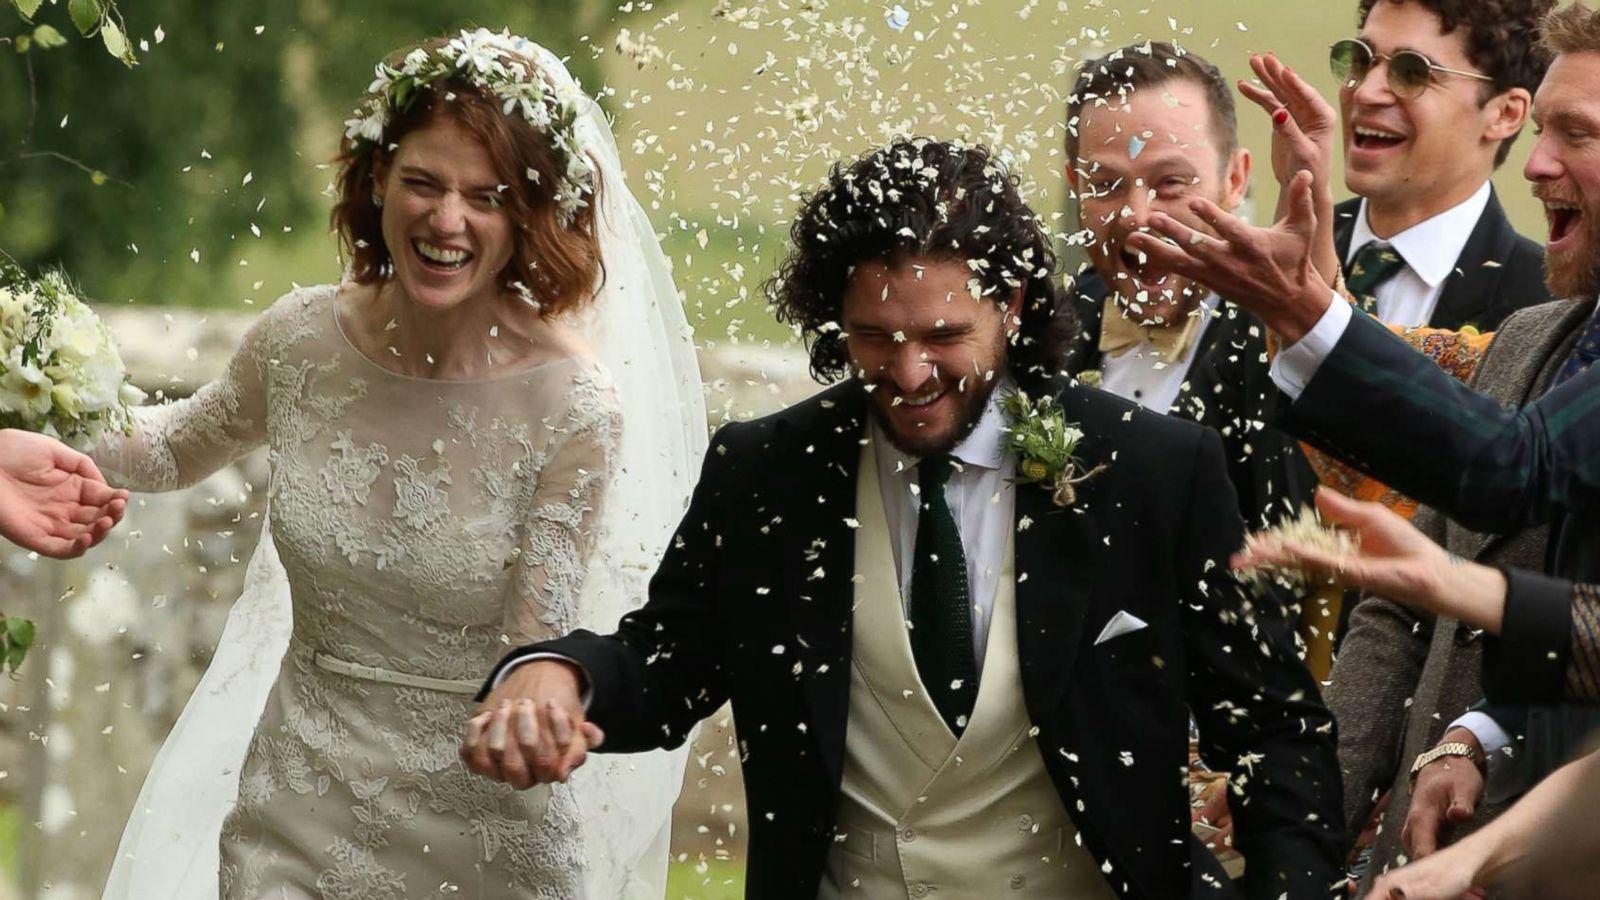 Kit Harington And Rose Leslie Wedding Guests